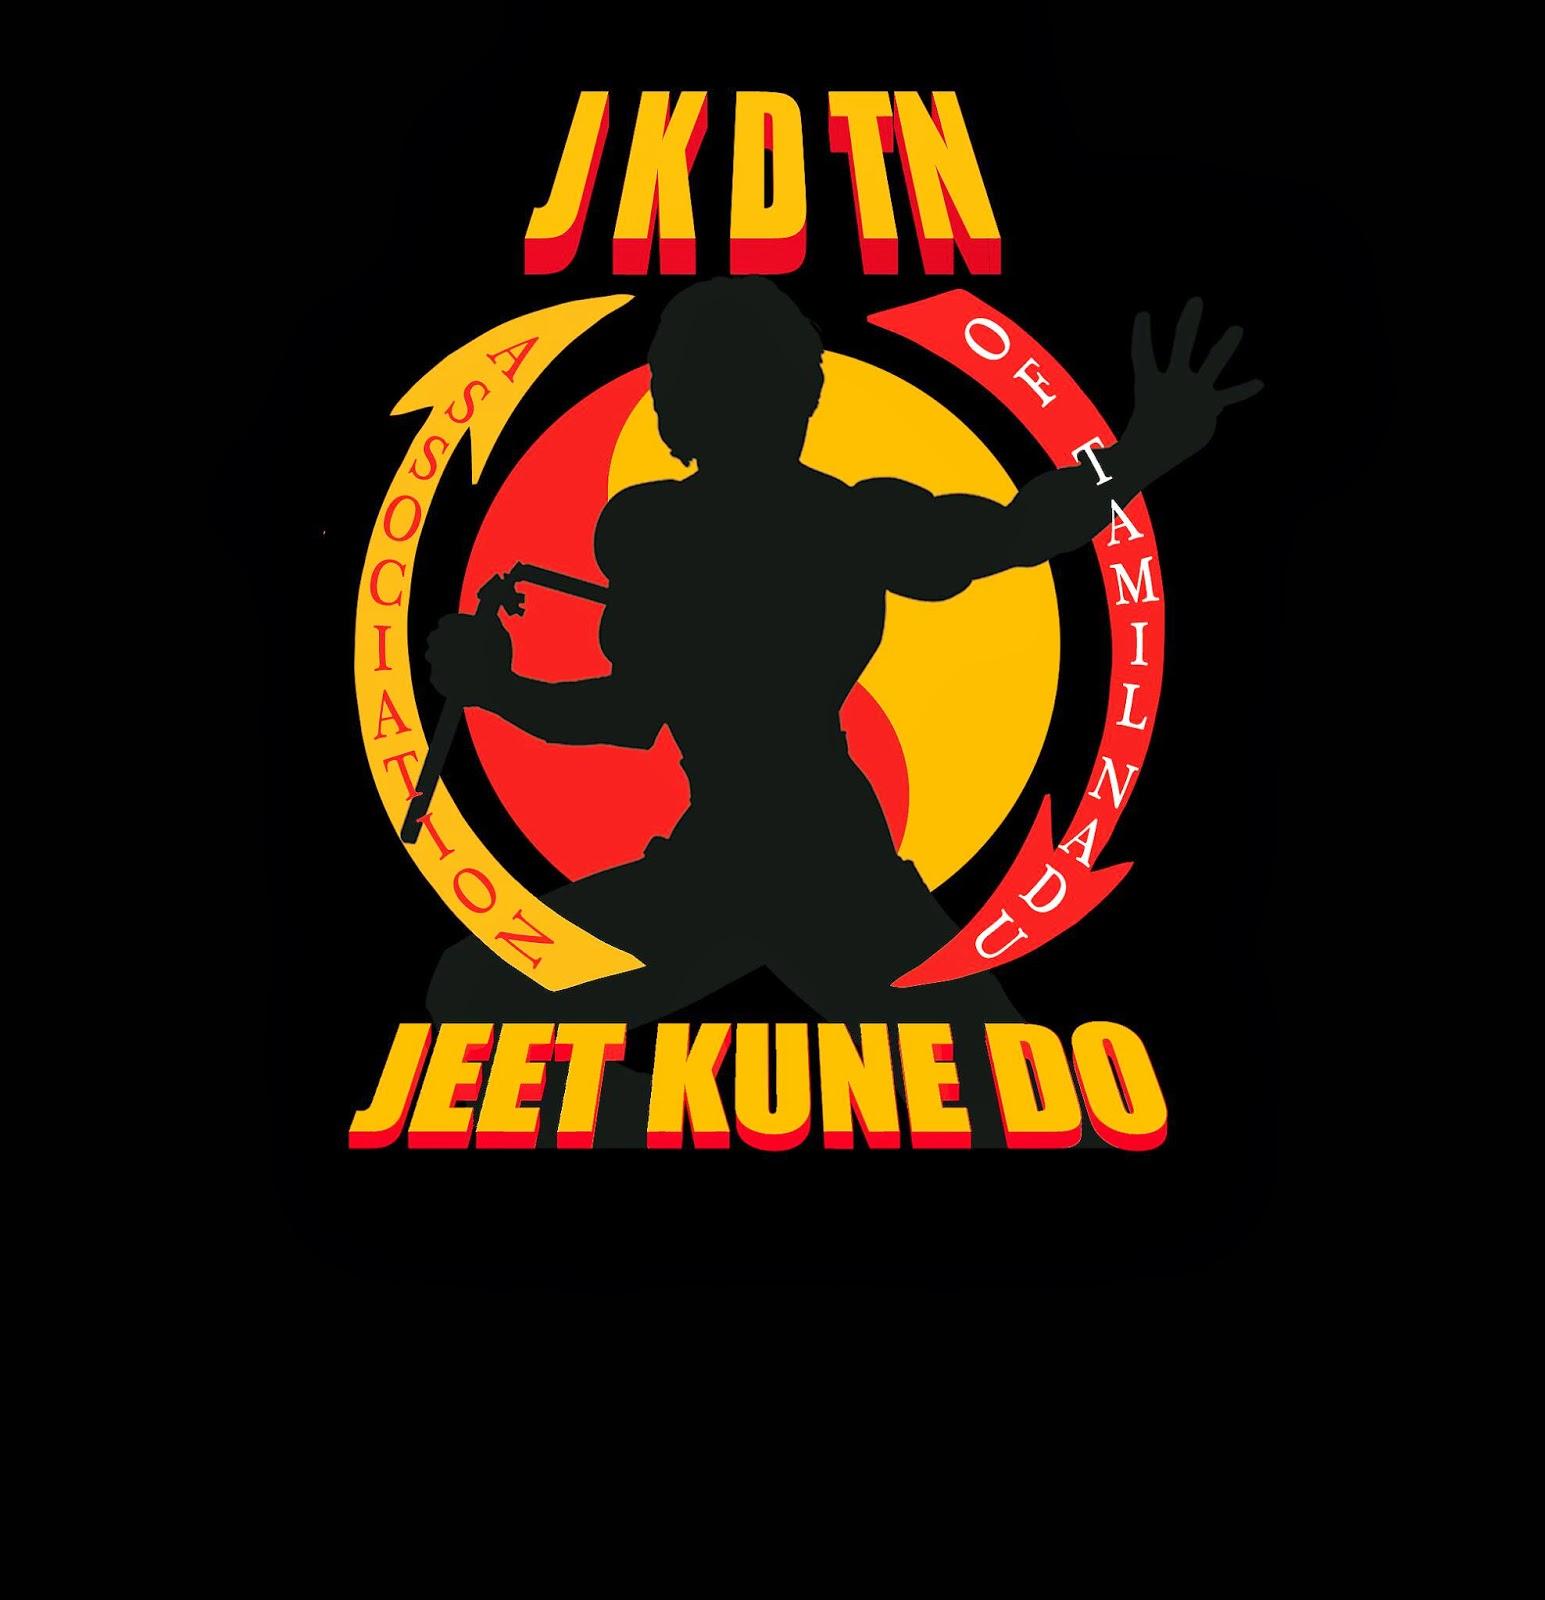 Jeet kune do symbol wallpaper jeet kune do symbol wallpaper pin jkd logo on pinter biocorpaavc